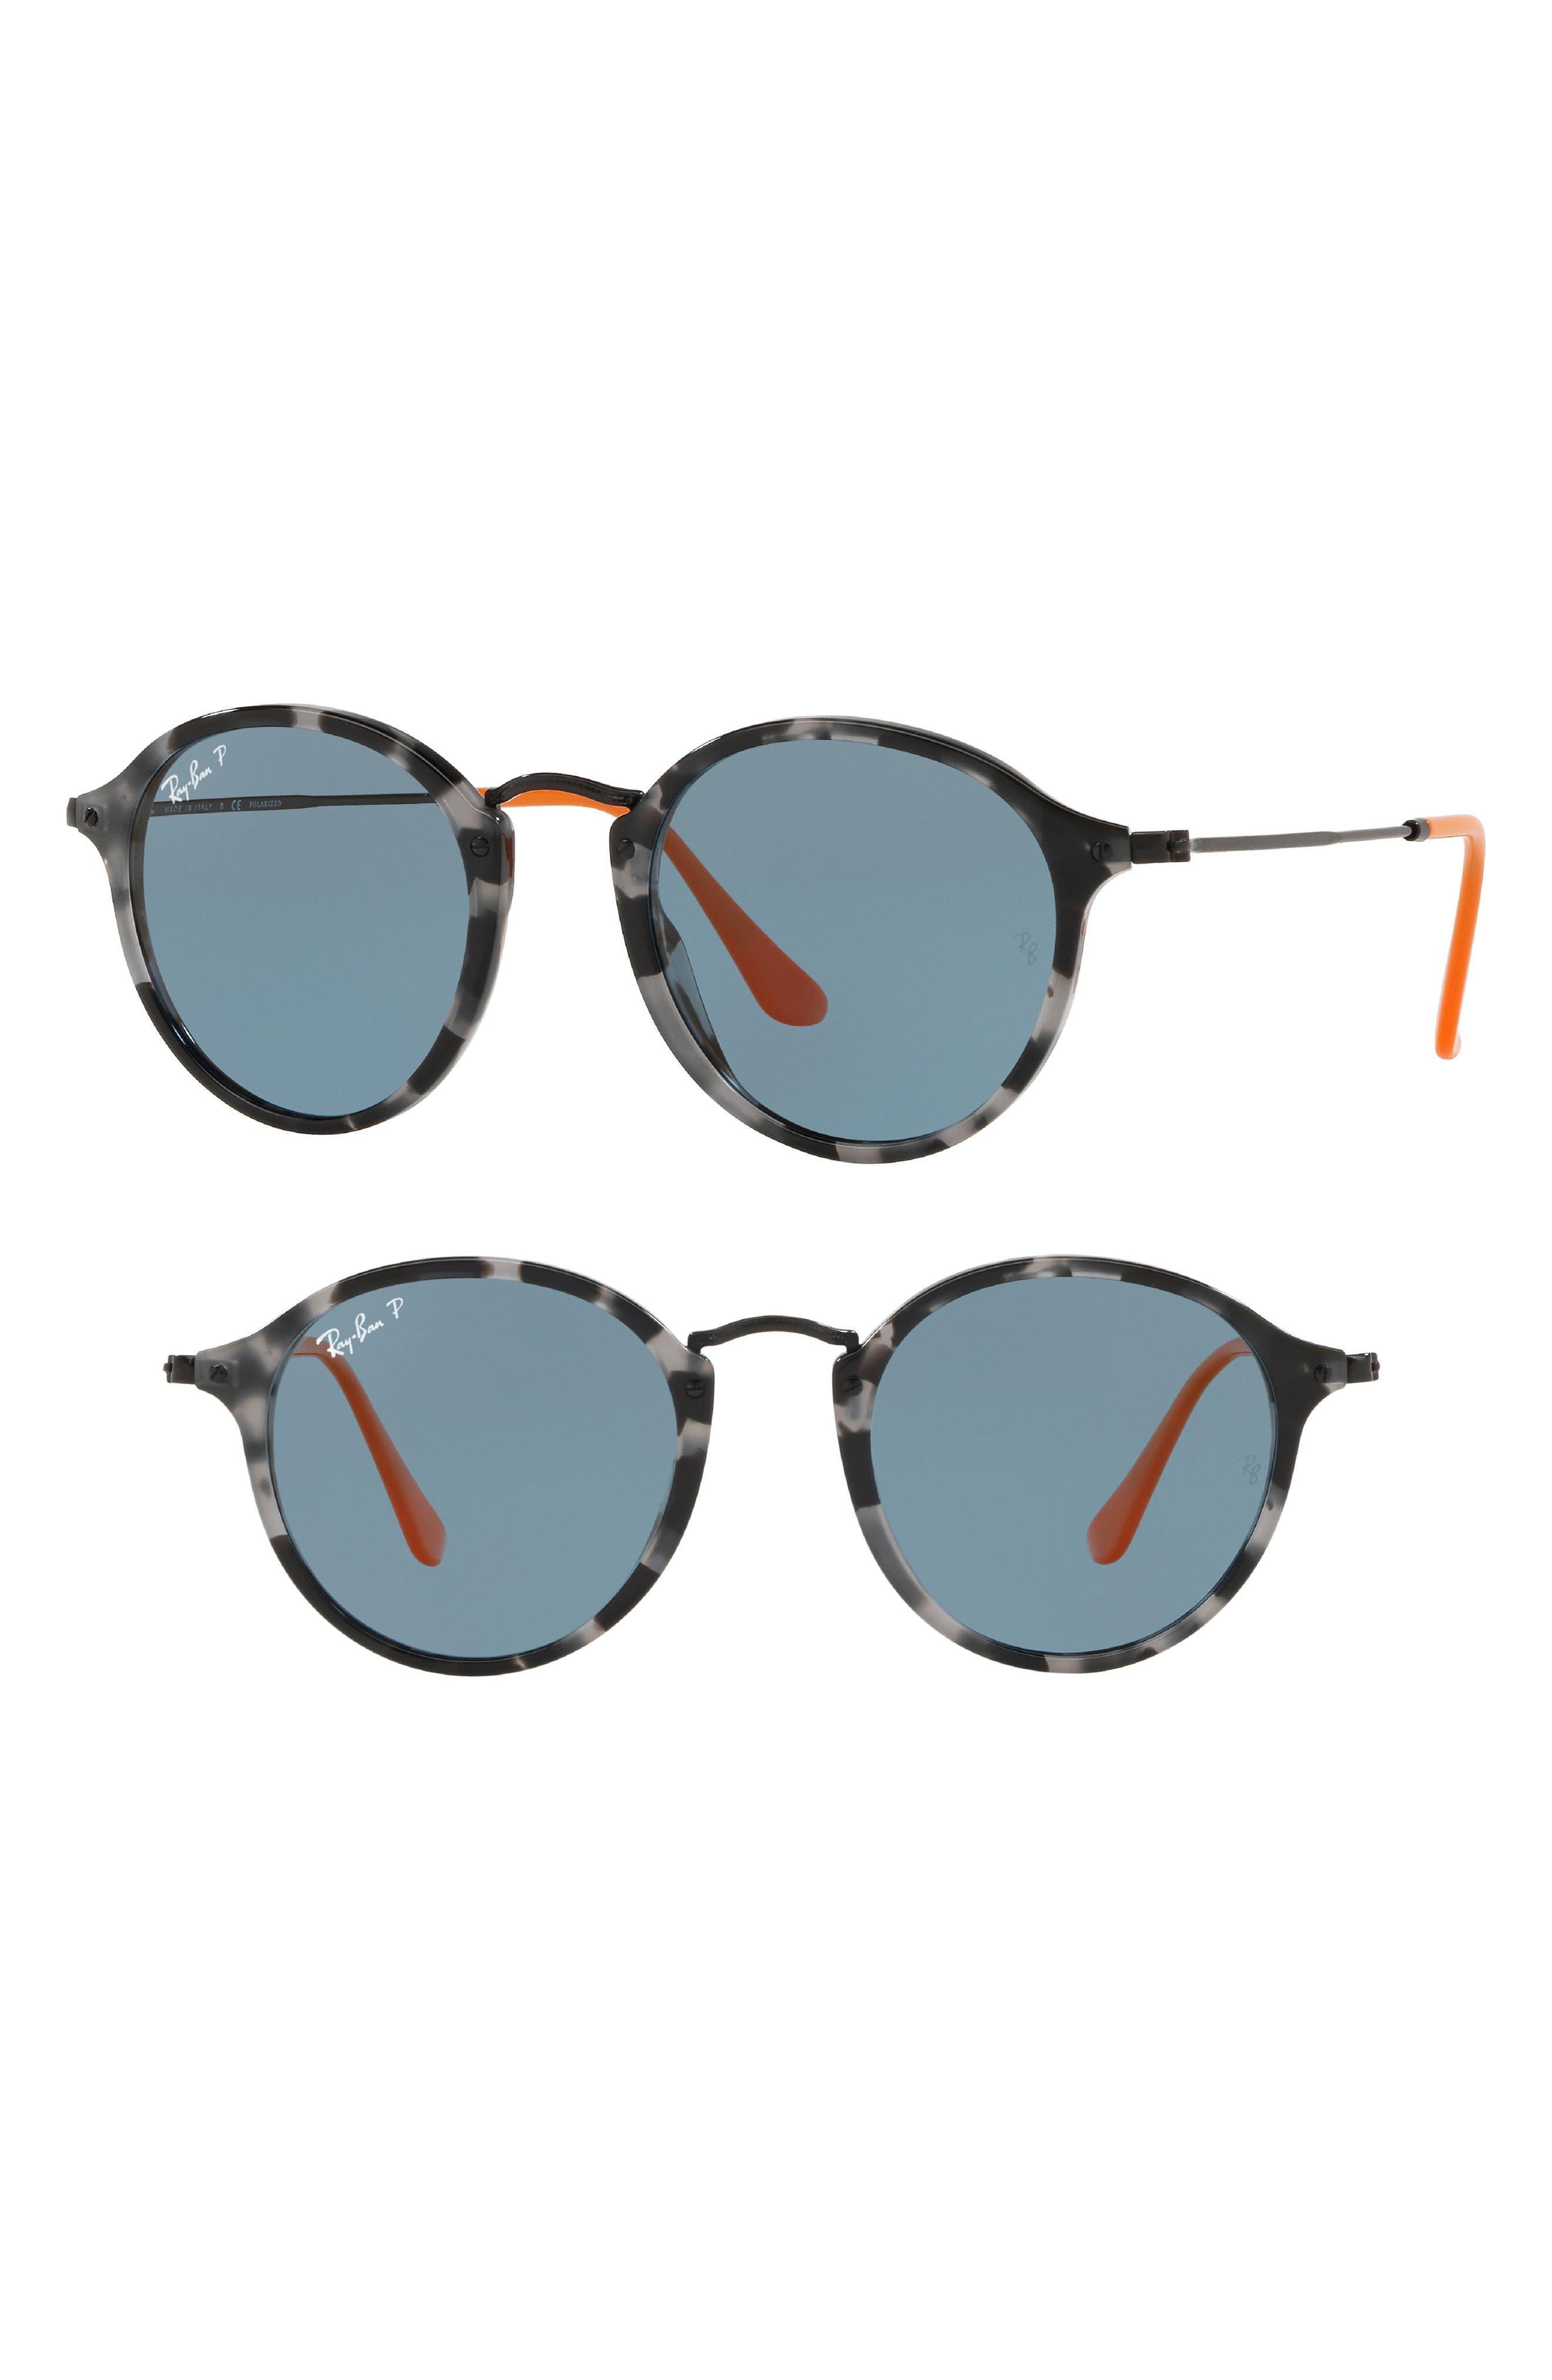 52mm Polarized Round Sunglasses,                             Main thumbnail 1, color,                             020